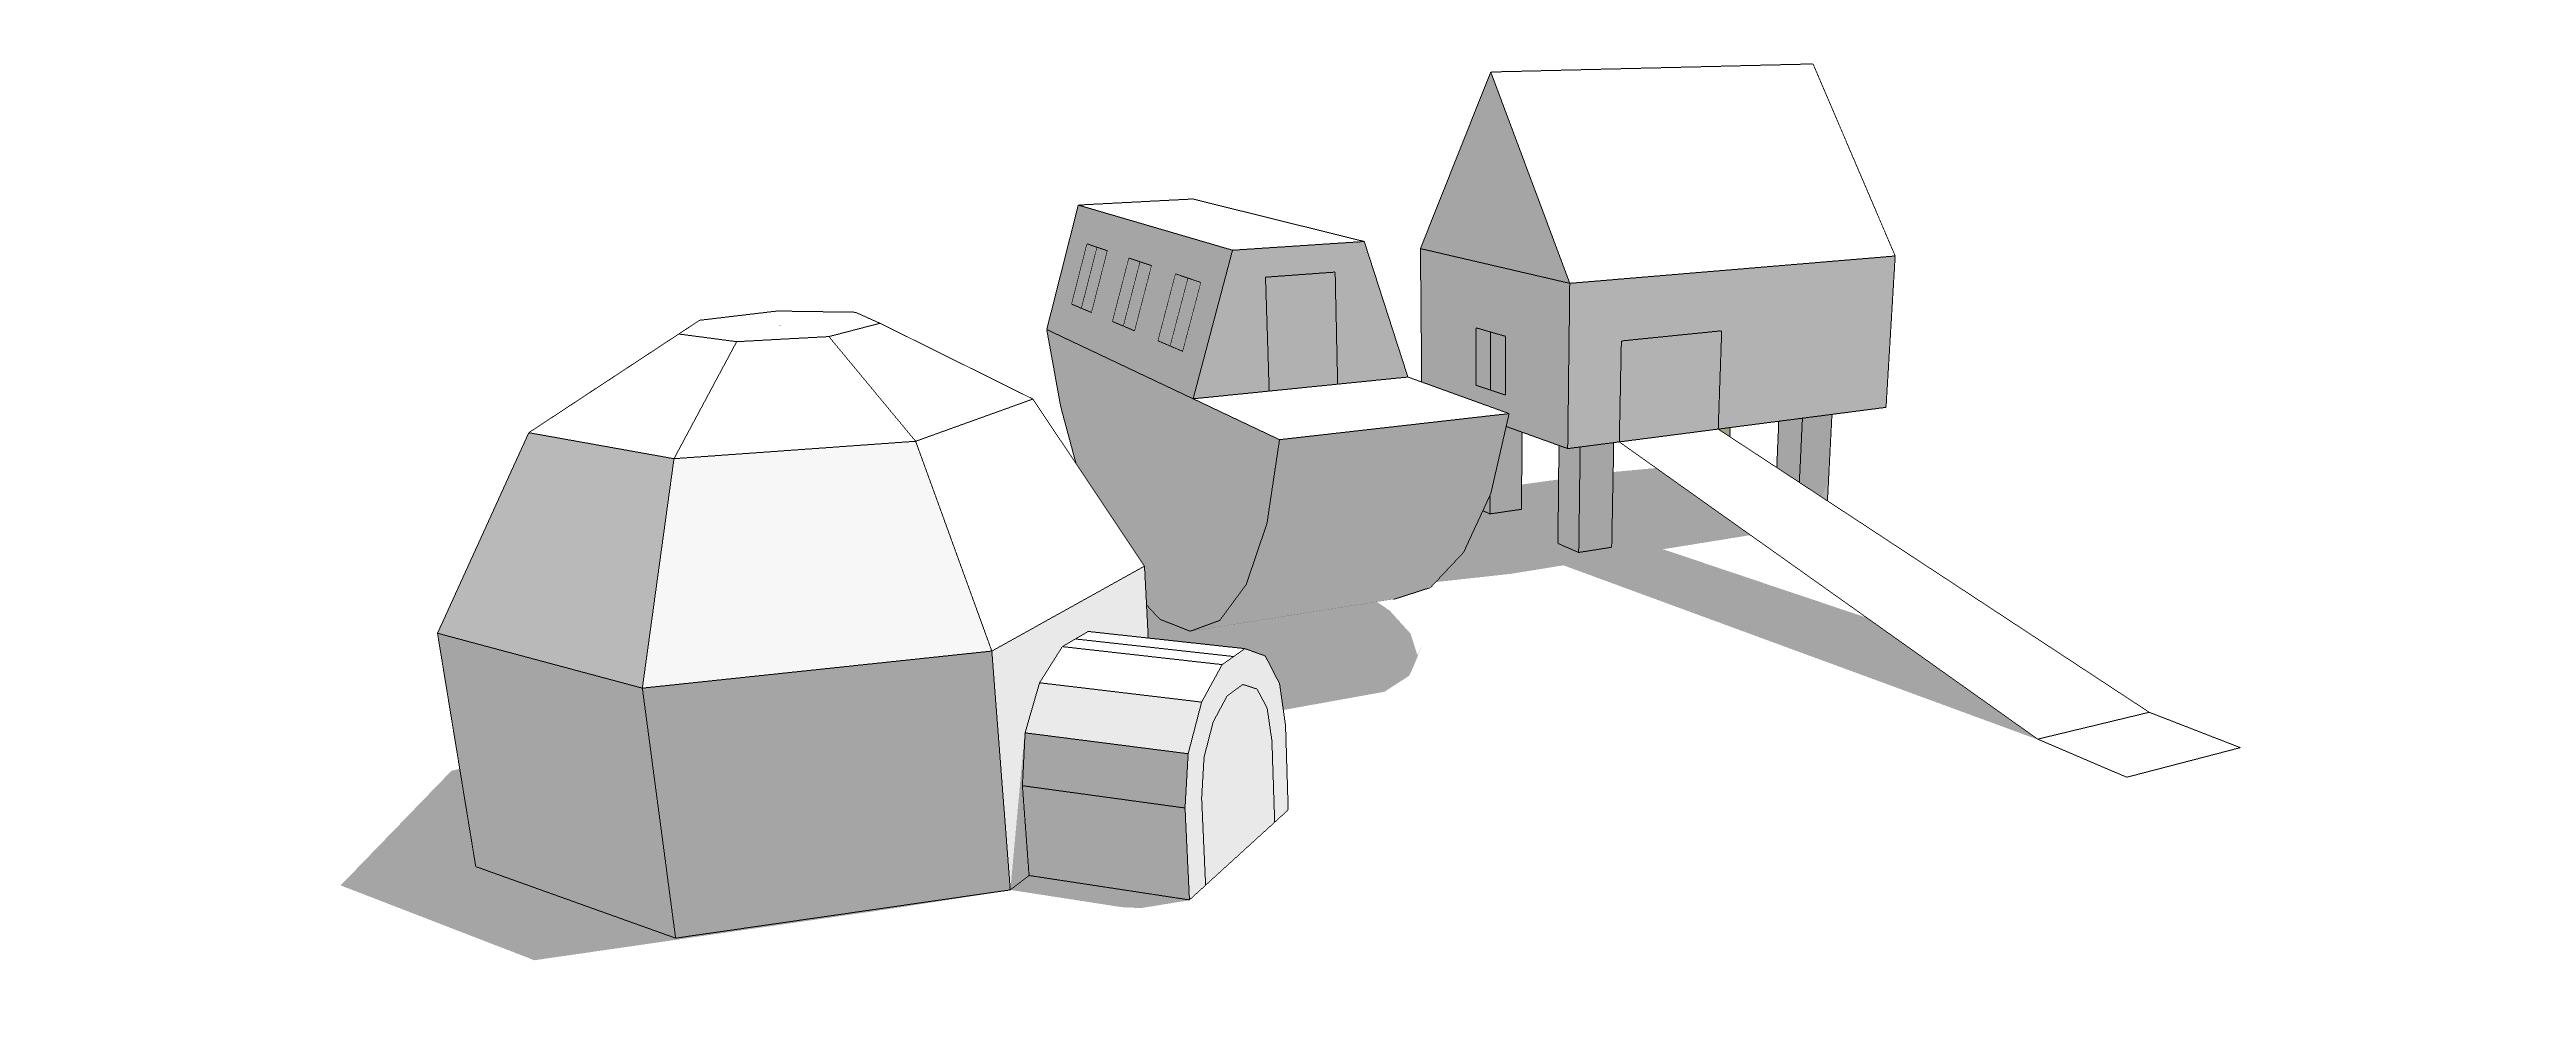 Houses in Behaviour6 copy